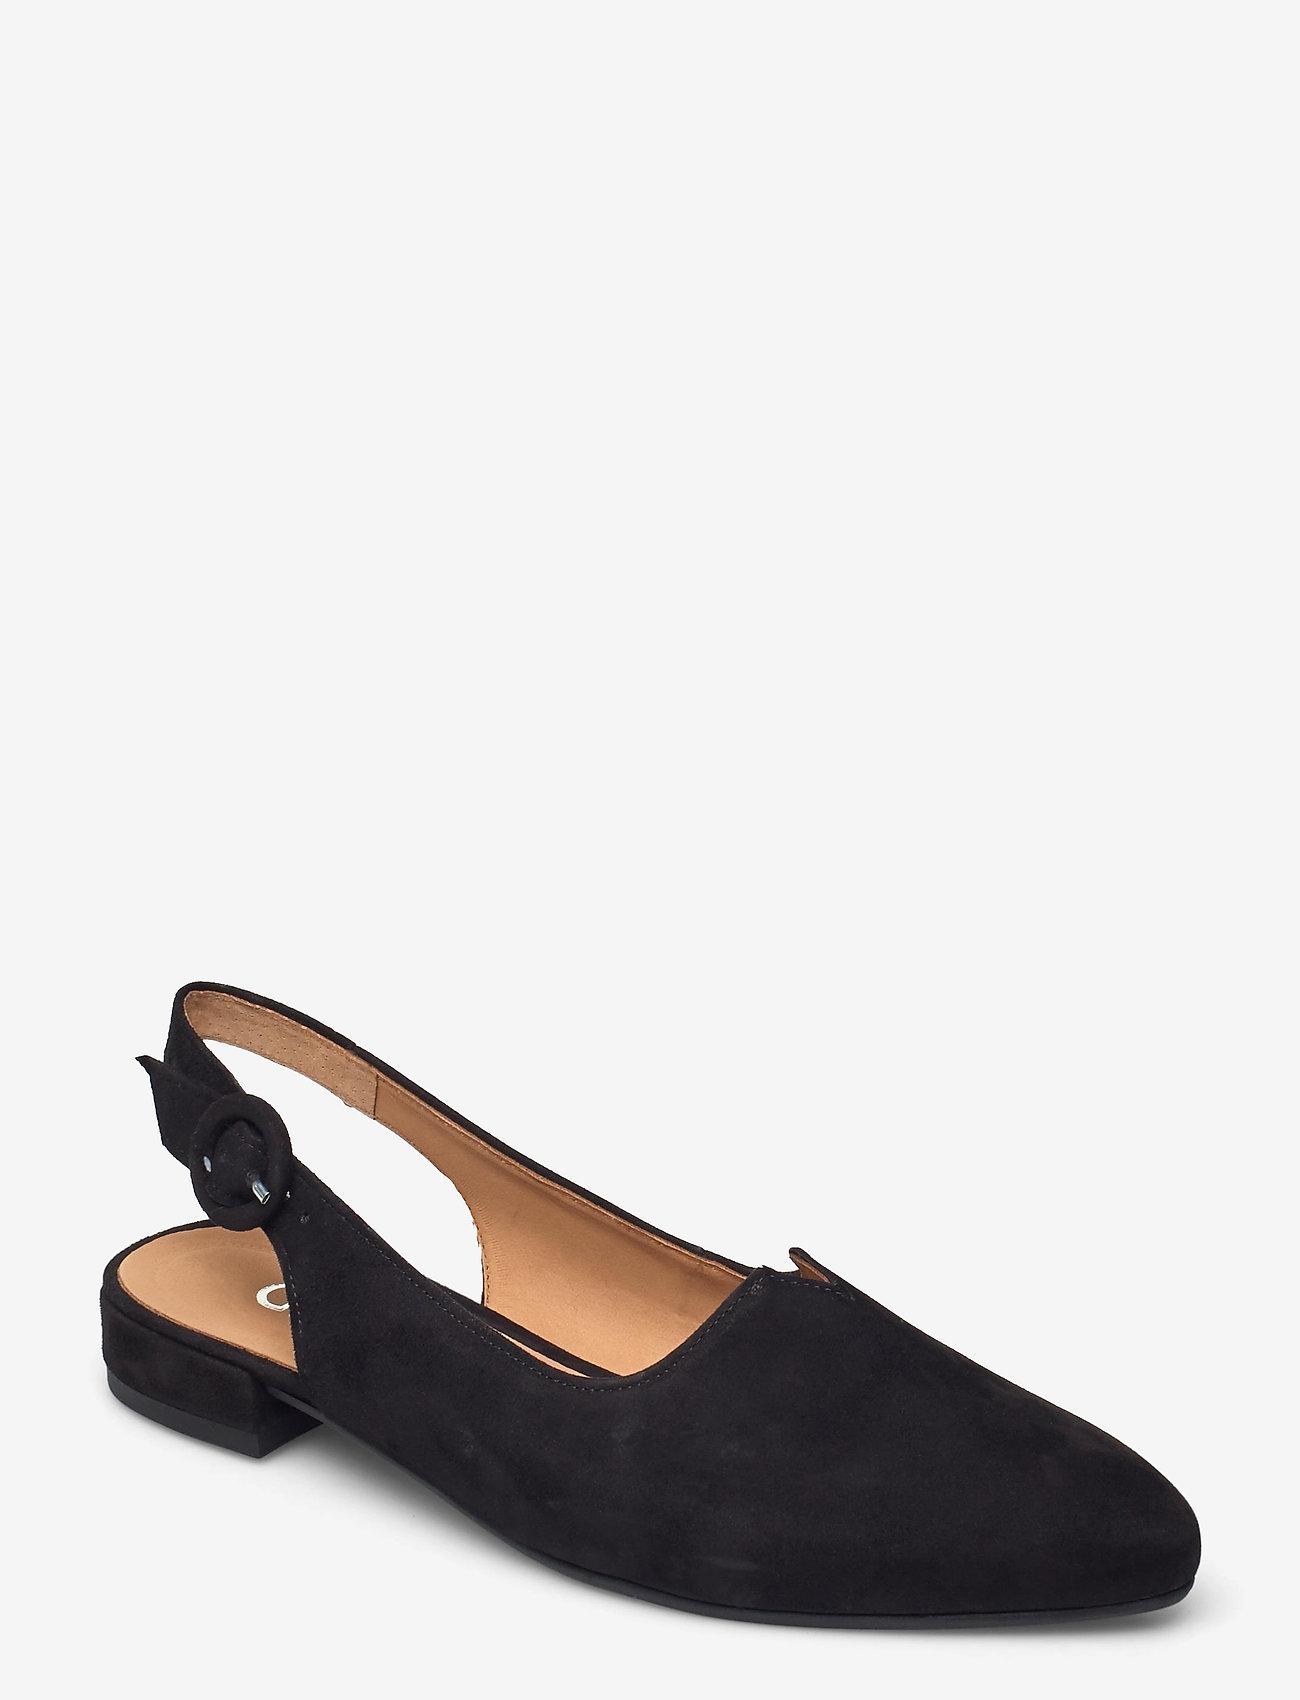 Gabor - Slings - ballerinas - black - 0